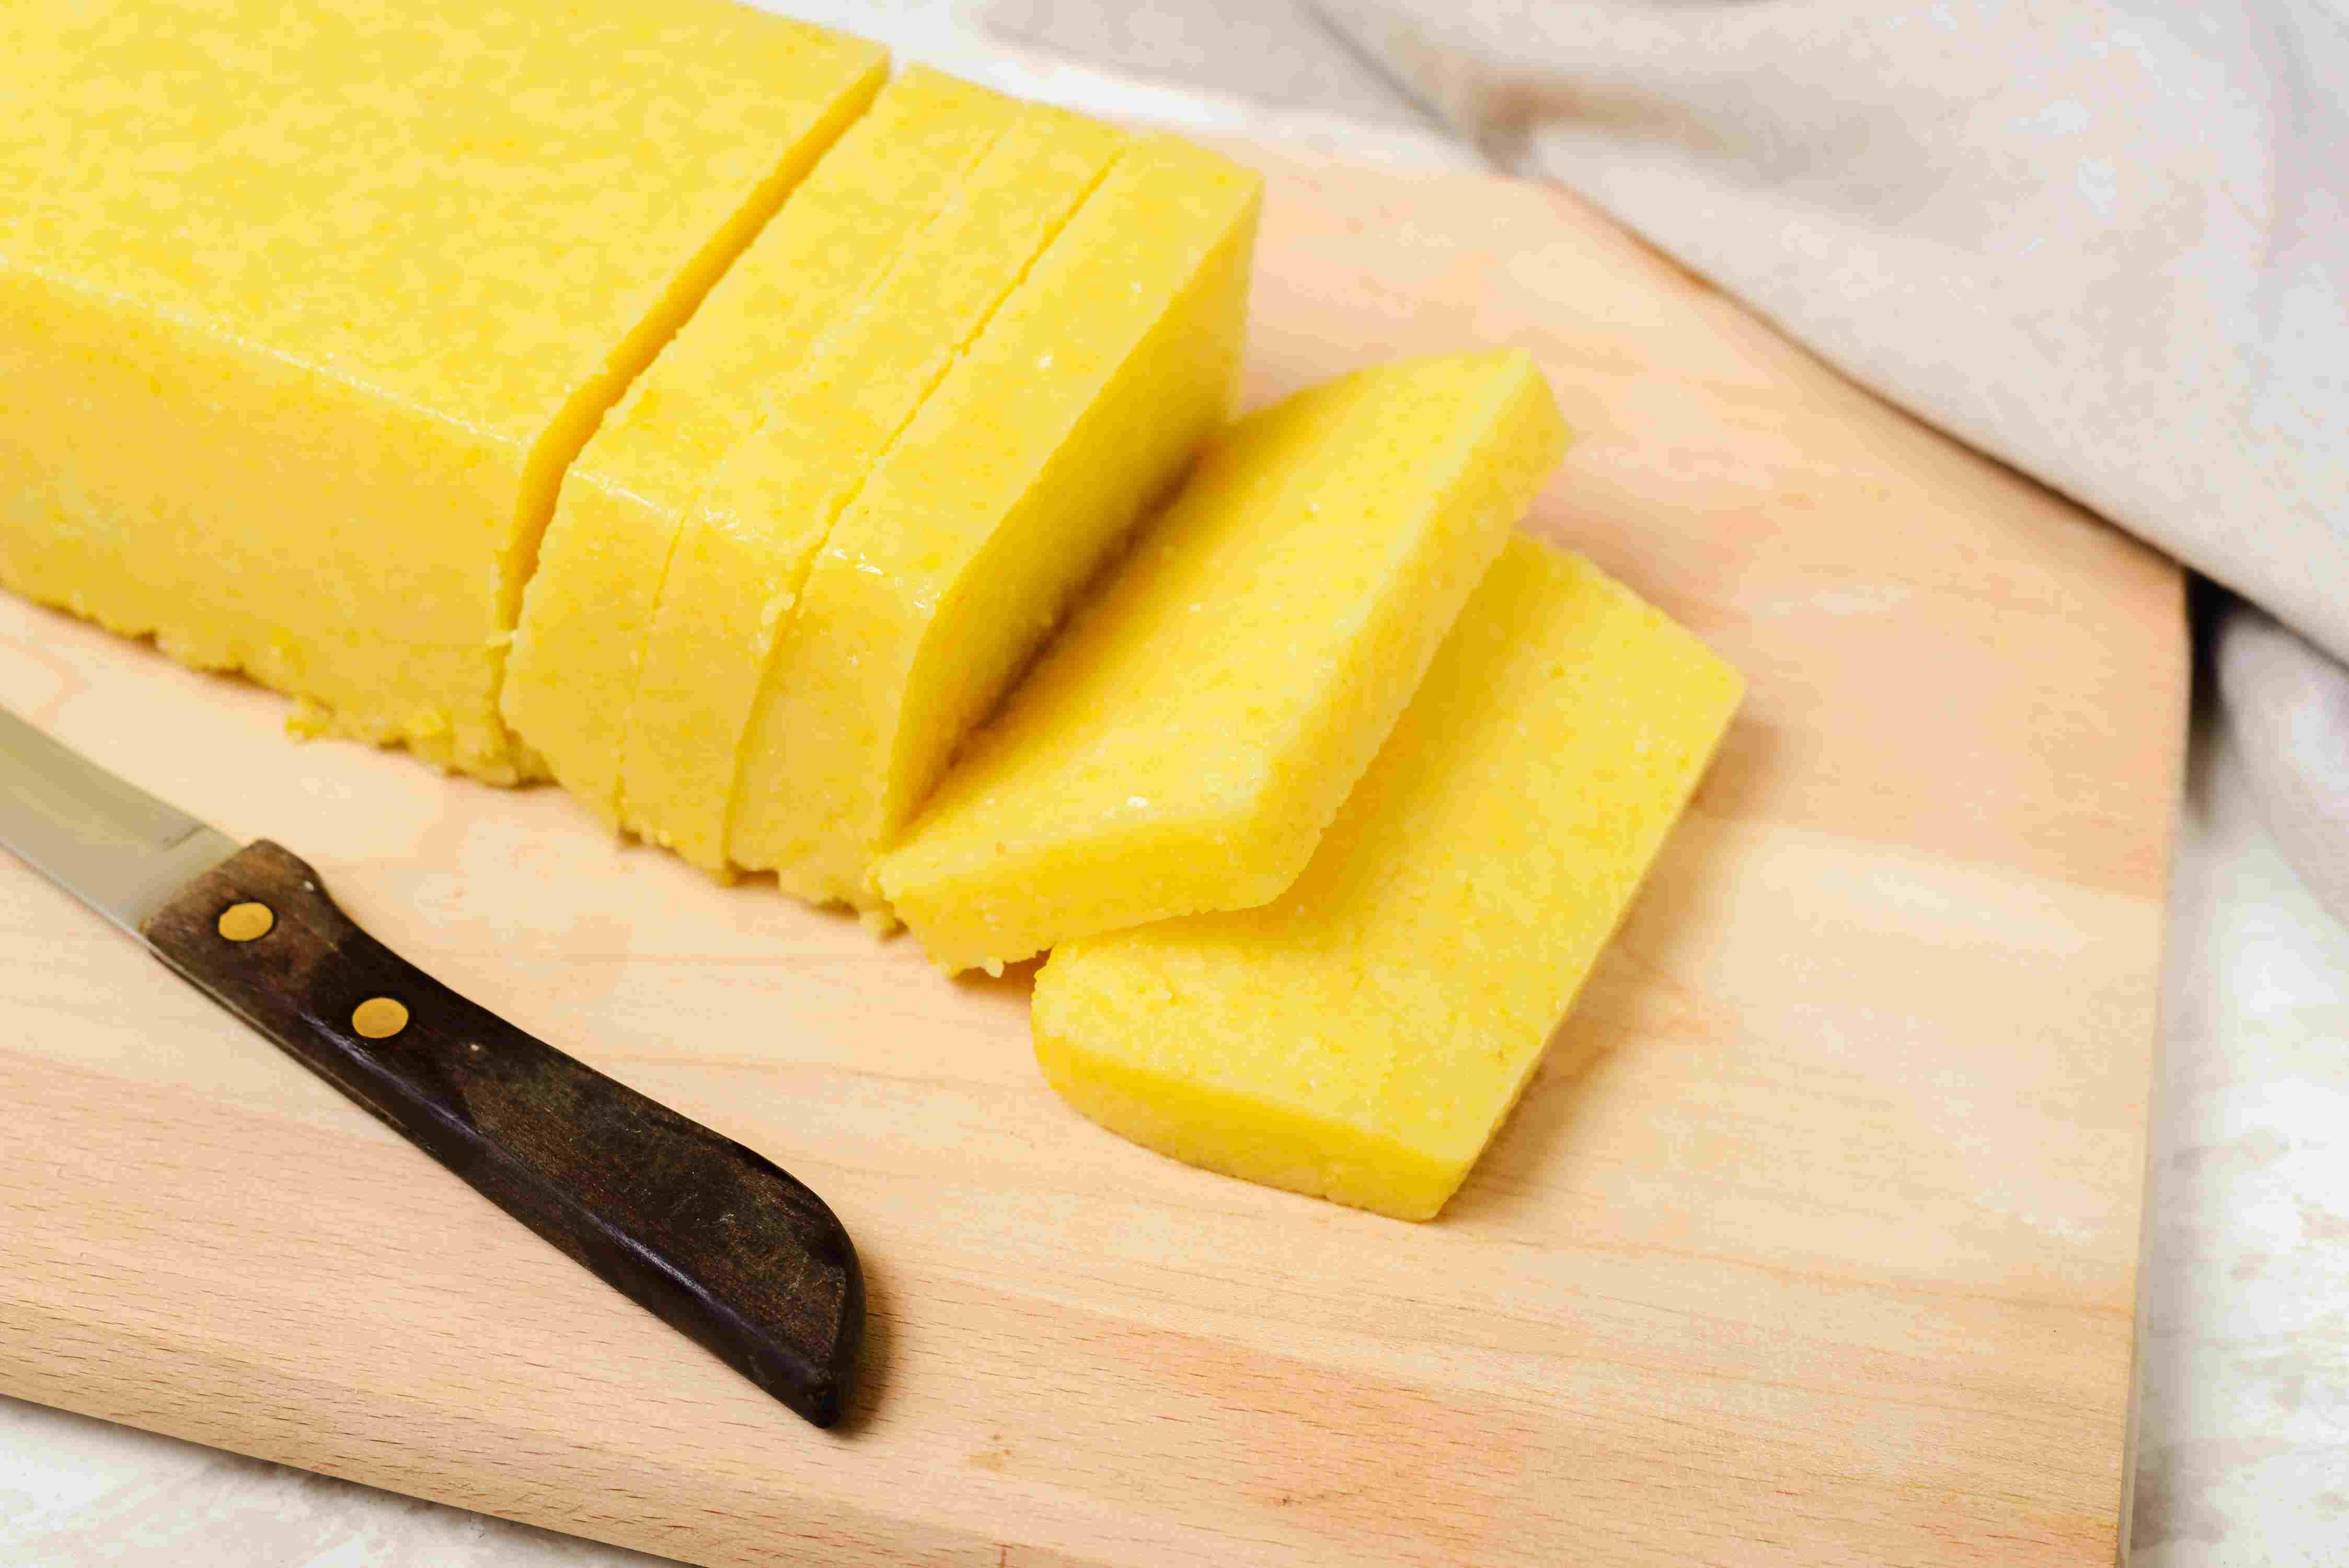 Cut polenta